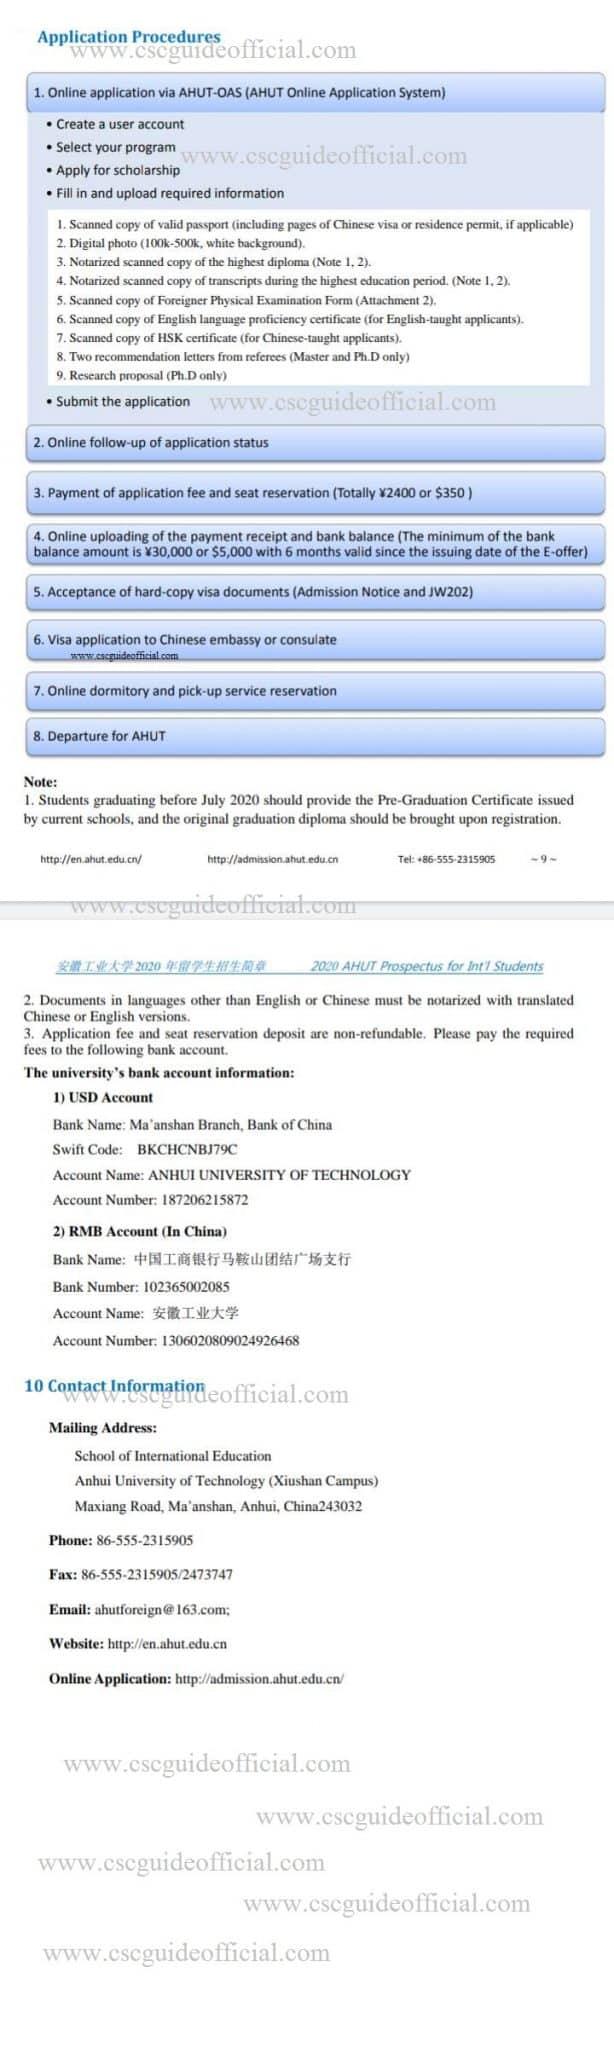 ahui university of technology anhui government